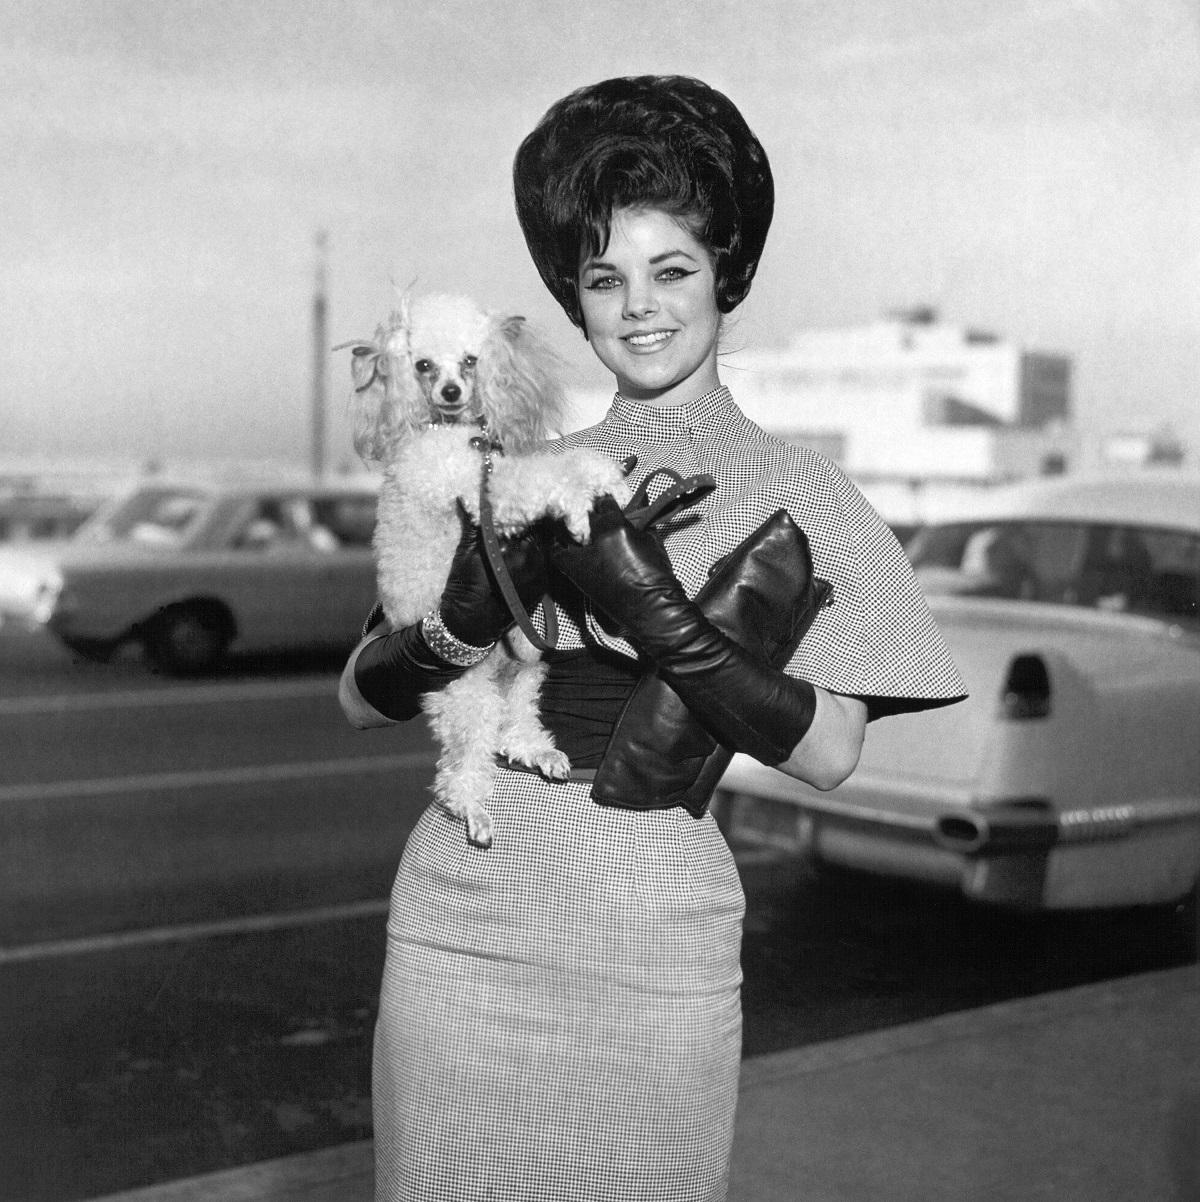 Priscilla Presley in 1963